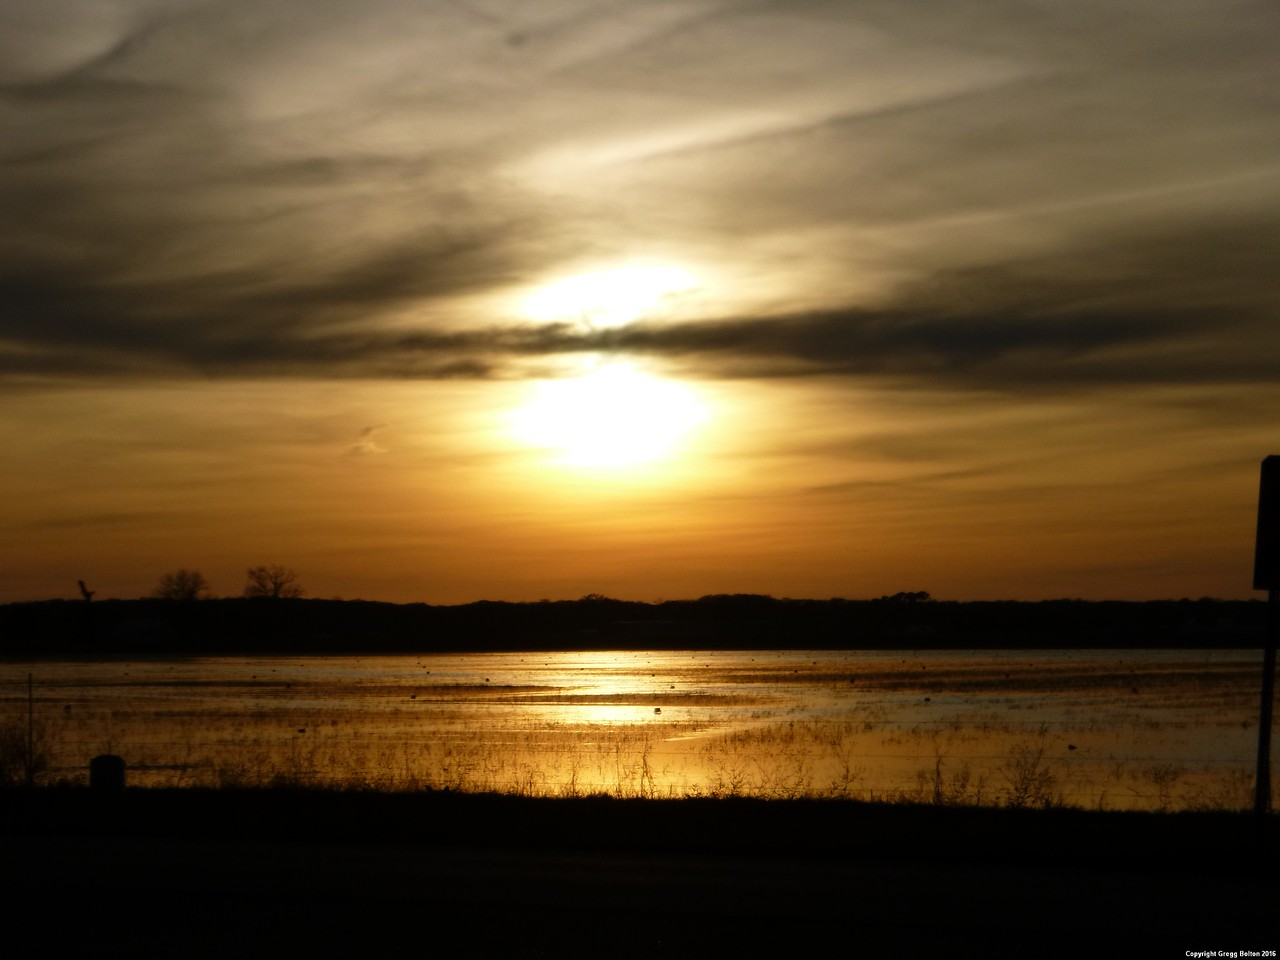 Sunset over the Rice Patties - Palmento Island, LA